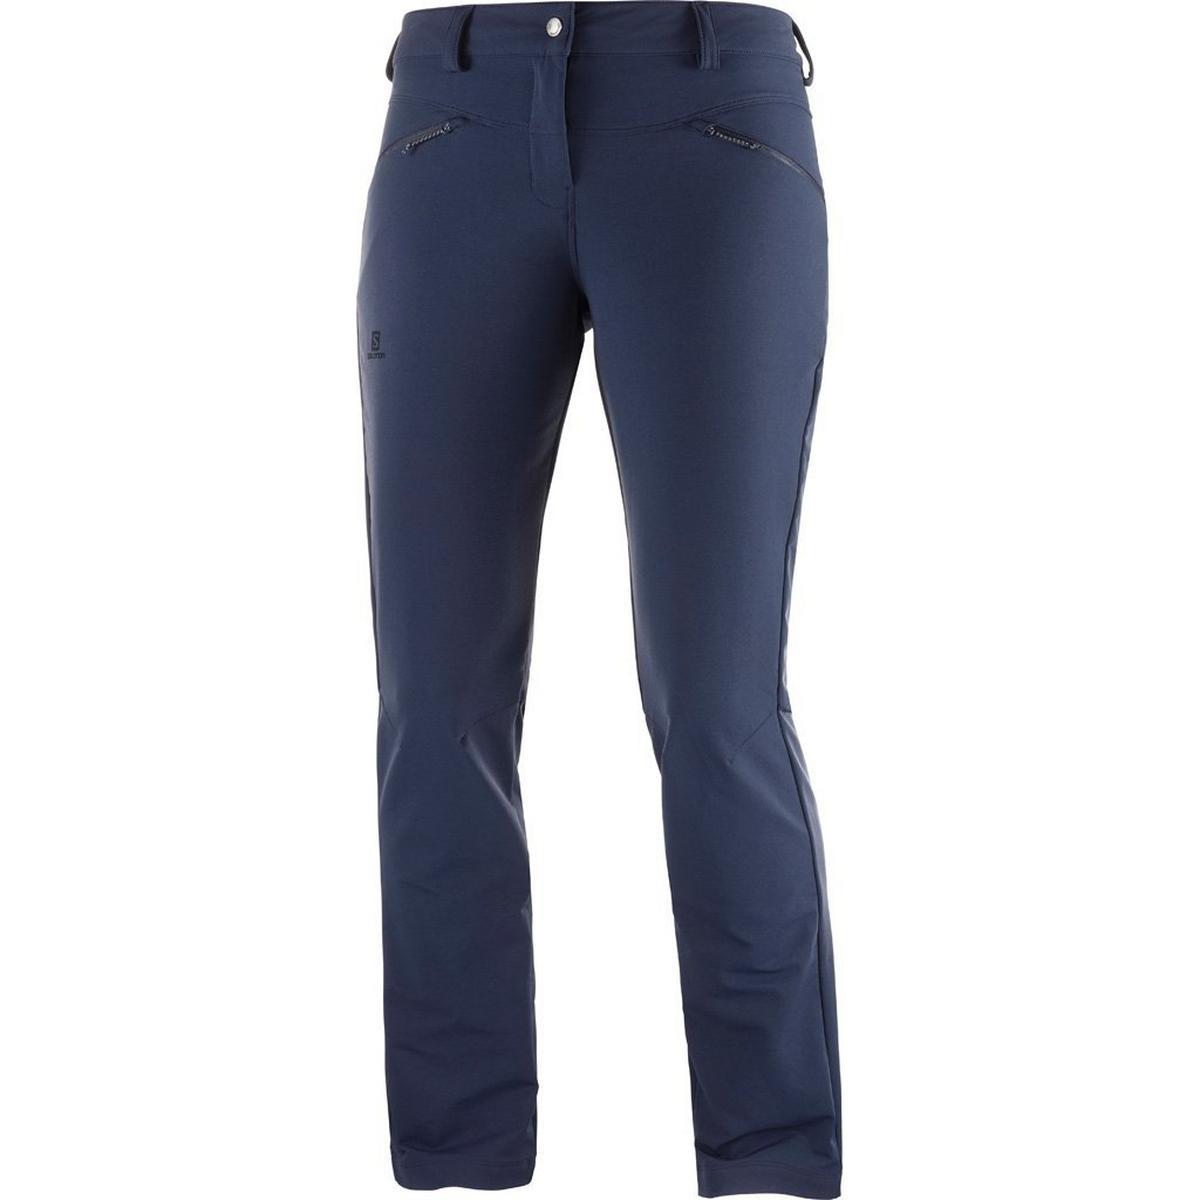 Salomon Pants Women's Wayfarer Straight Warm REGULAR Leg Trousers Night Sky